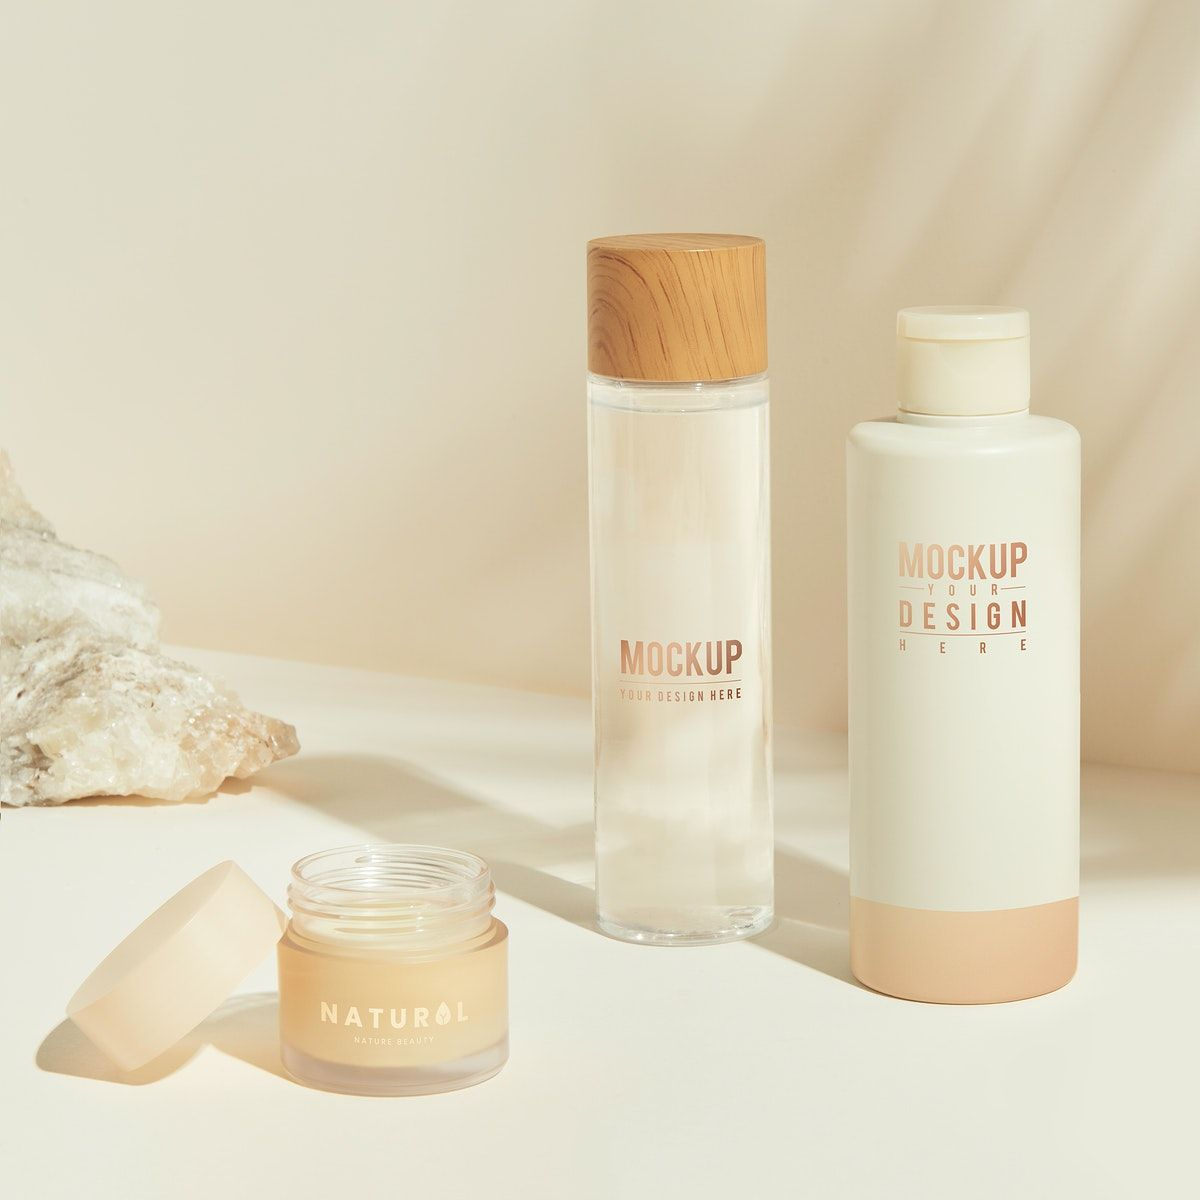 Download Premium Psd Of Set Of Skin Care Package Mockup Design 2365326 In 2021 Skin Care Packaging Cosmetics Mockup Mockup Design